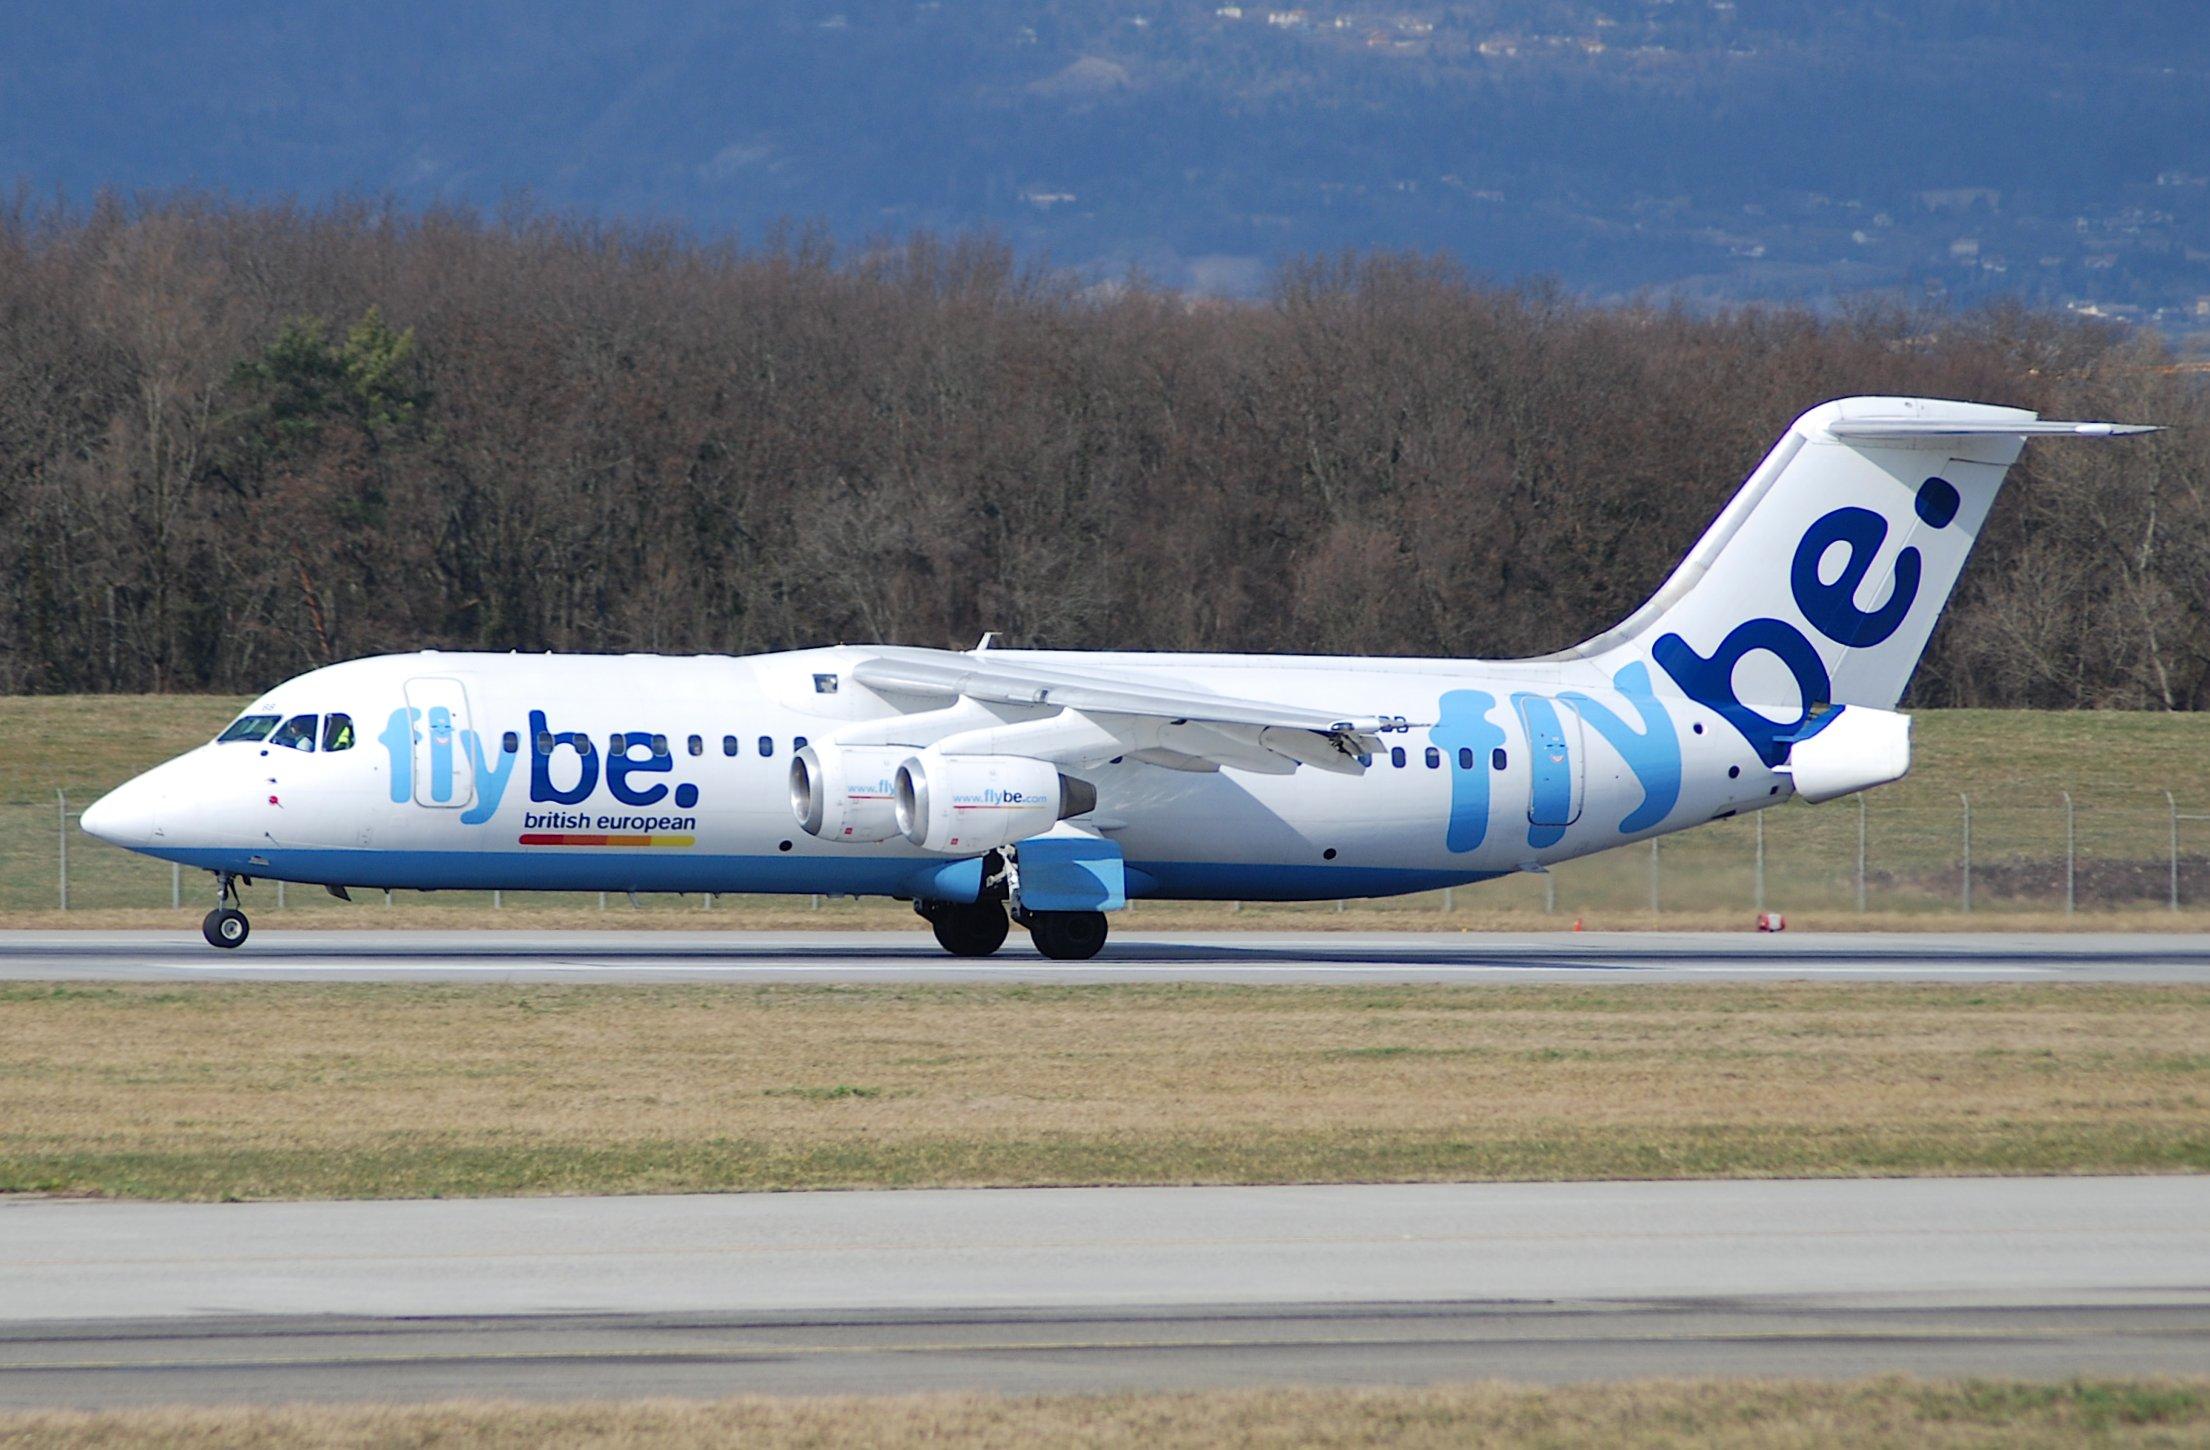 flybe - photo #6